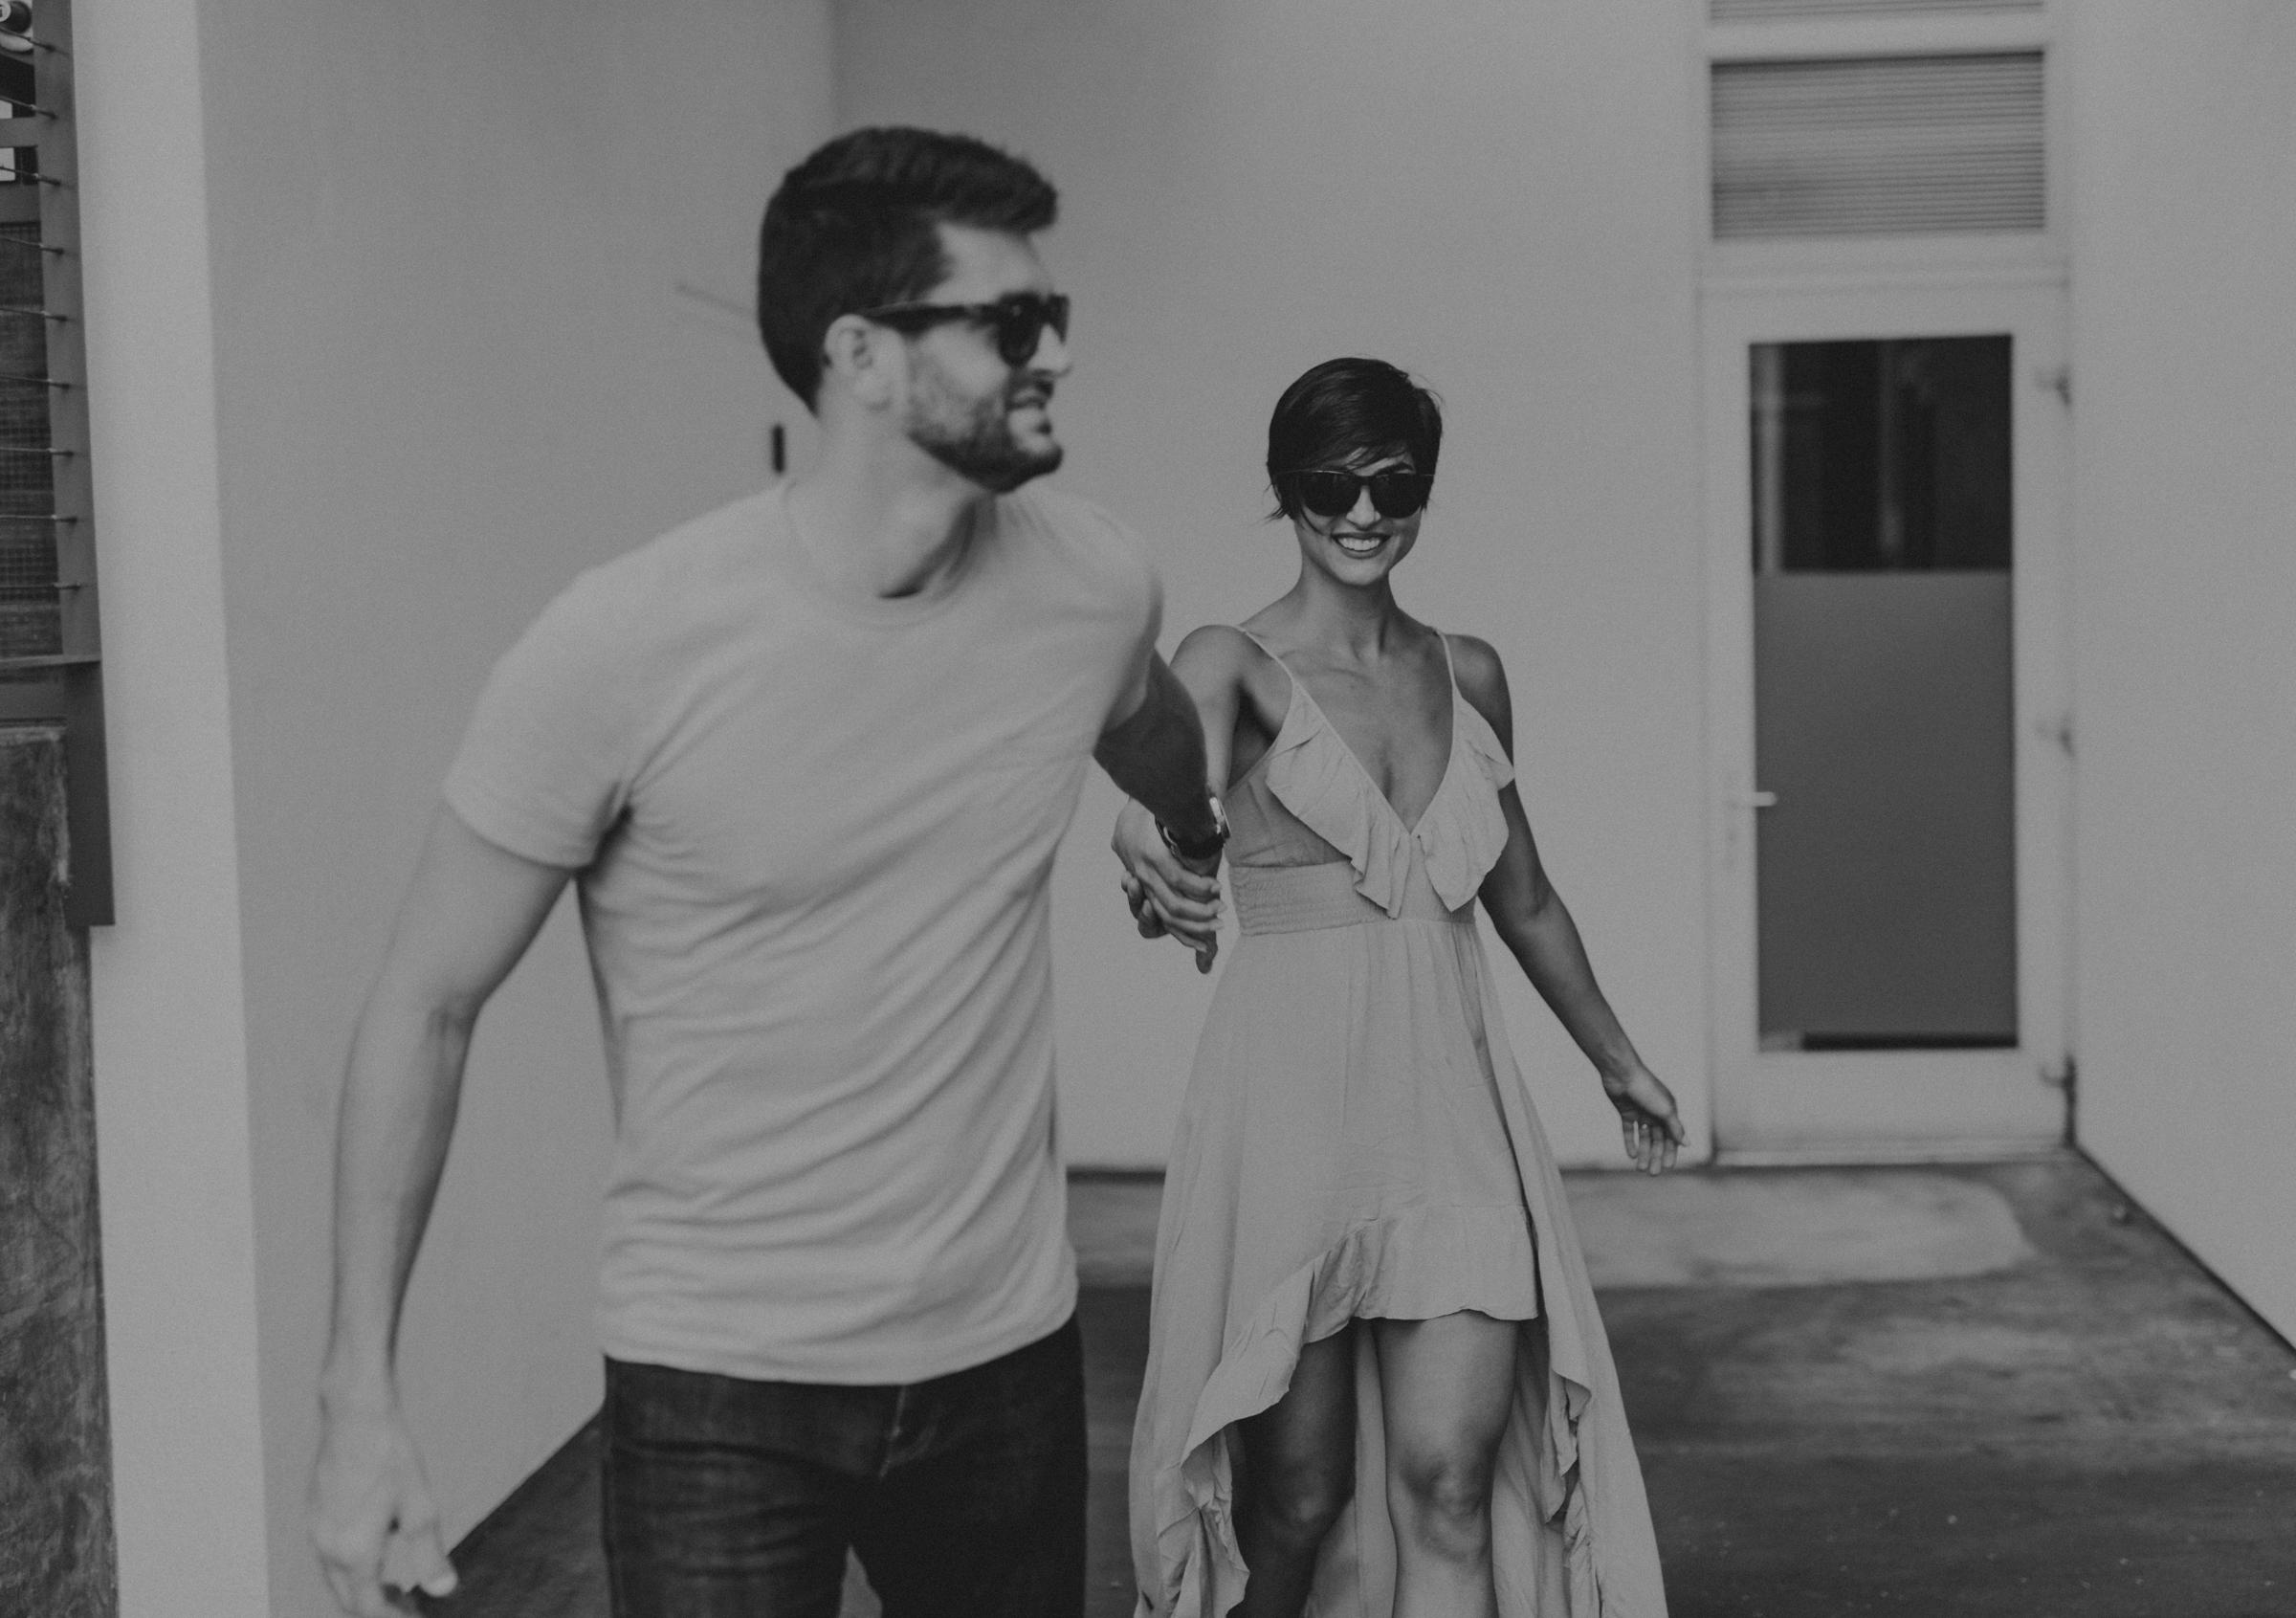 Isaiah + Taylor Photography - Venice Beach & Santa Monica Engagement Session, Los Angeles Wedding Photographer-042.jpg